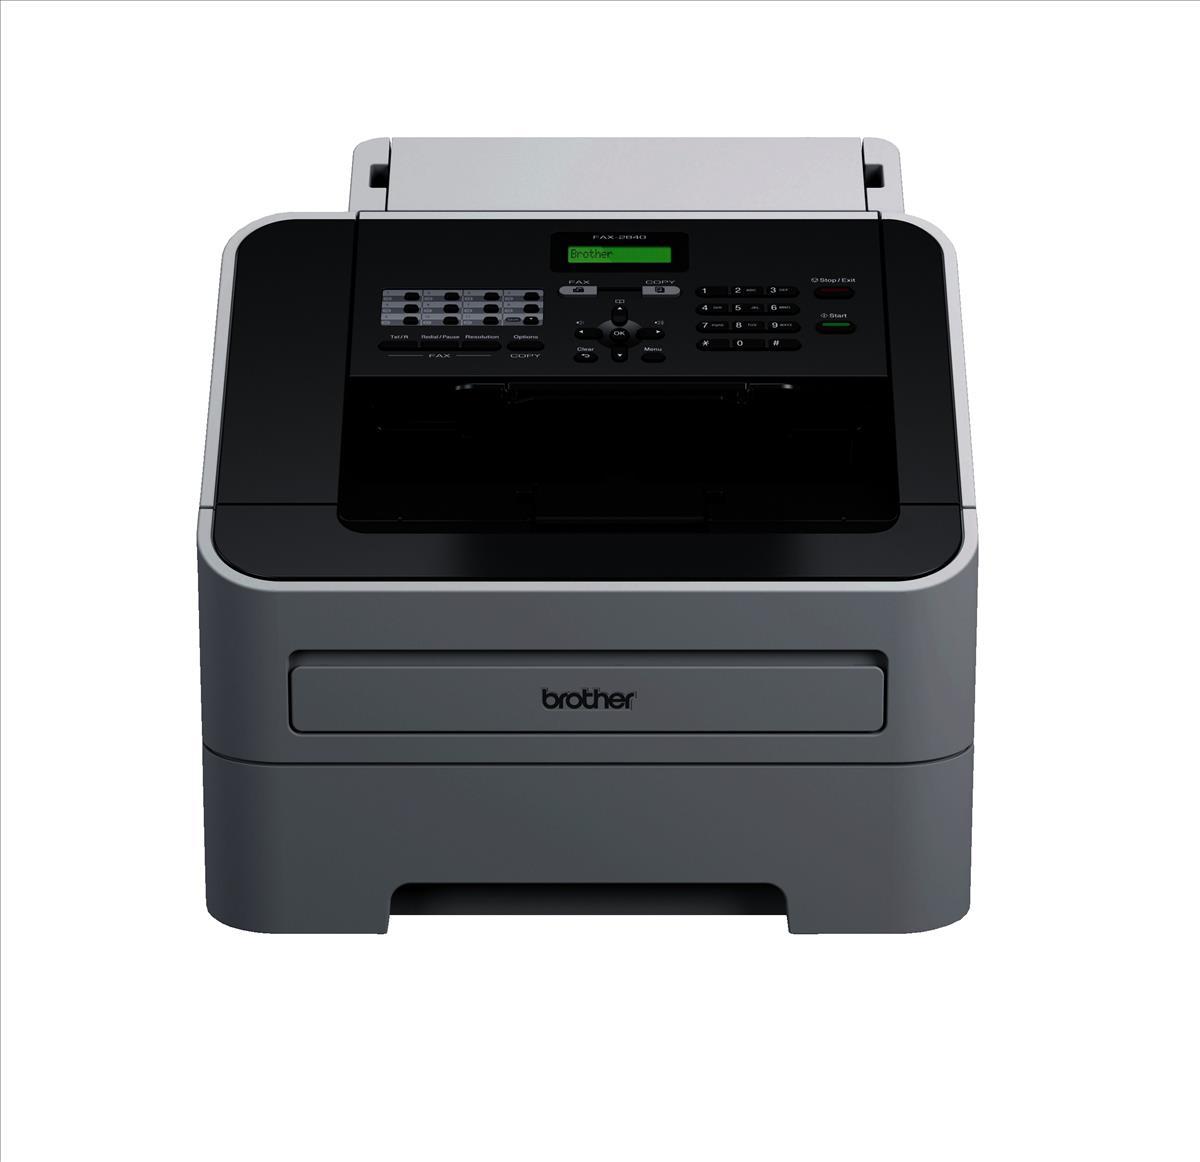 Brother FAX-2940 Printer Windows 7